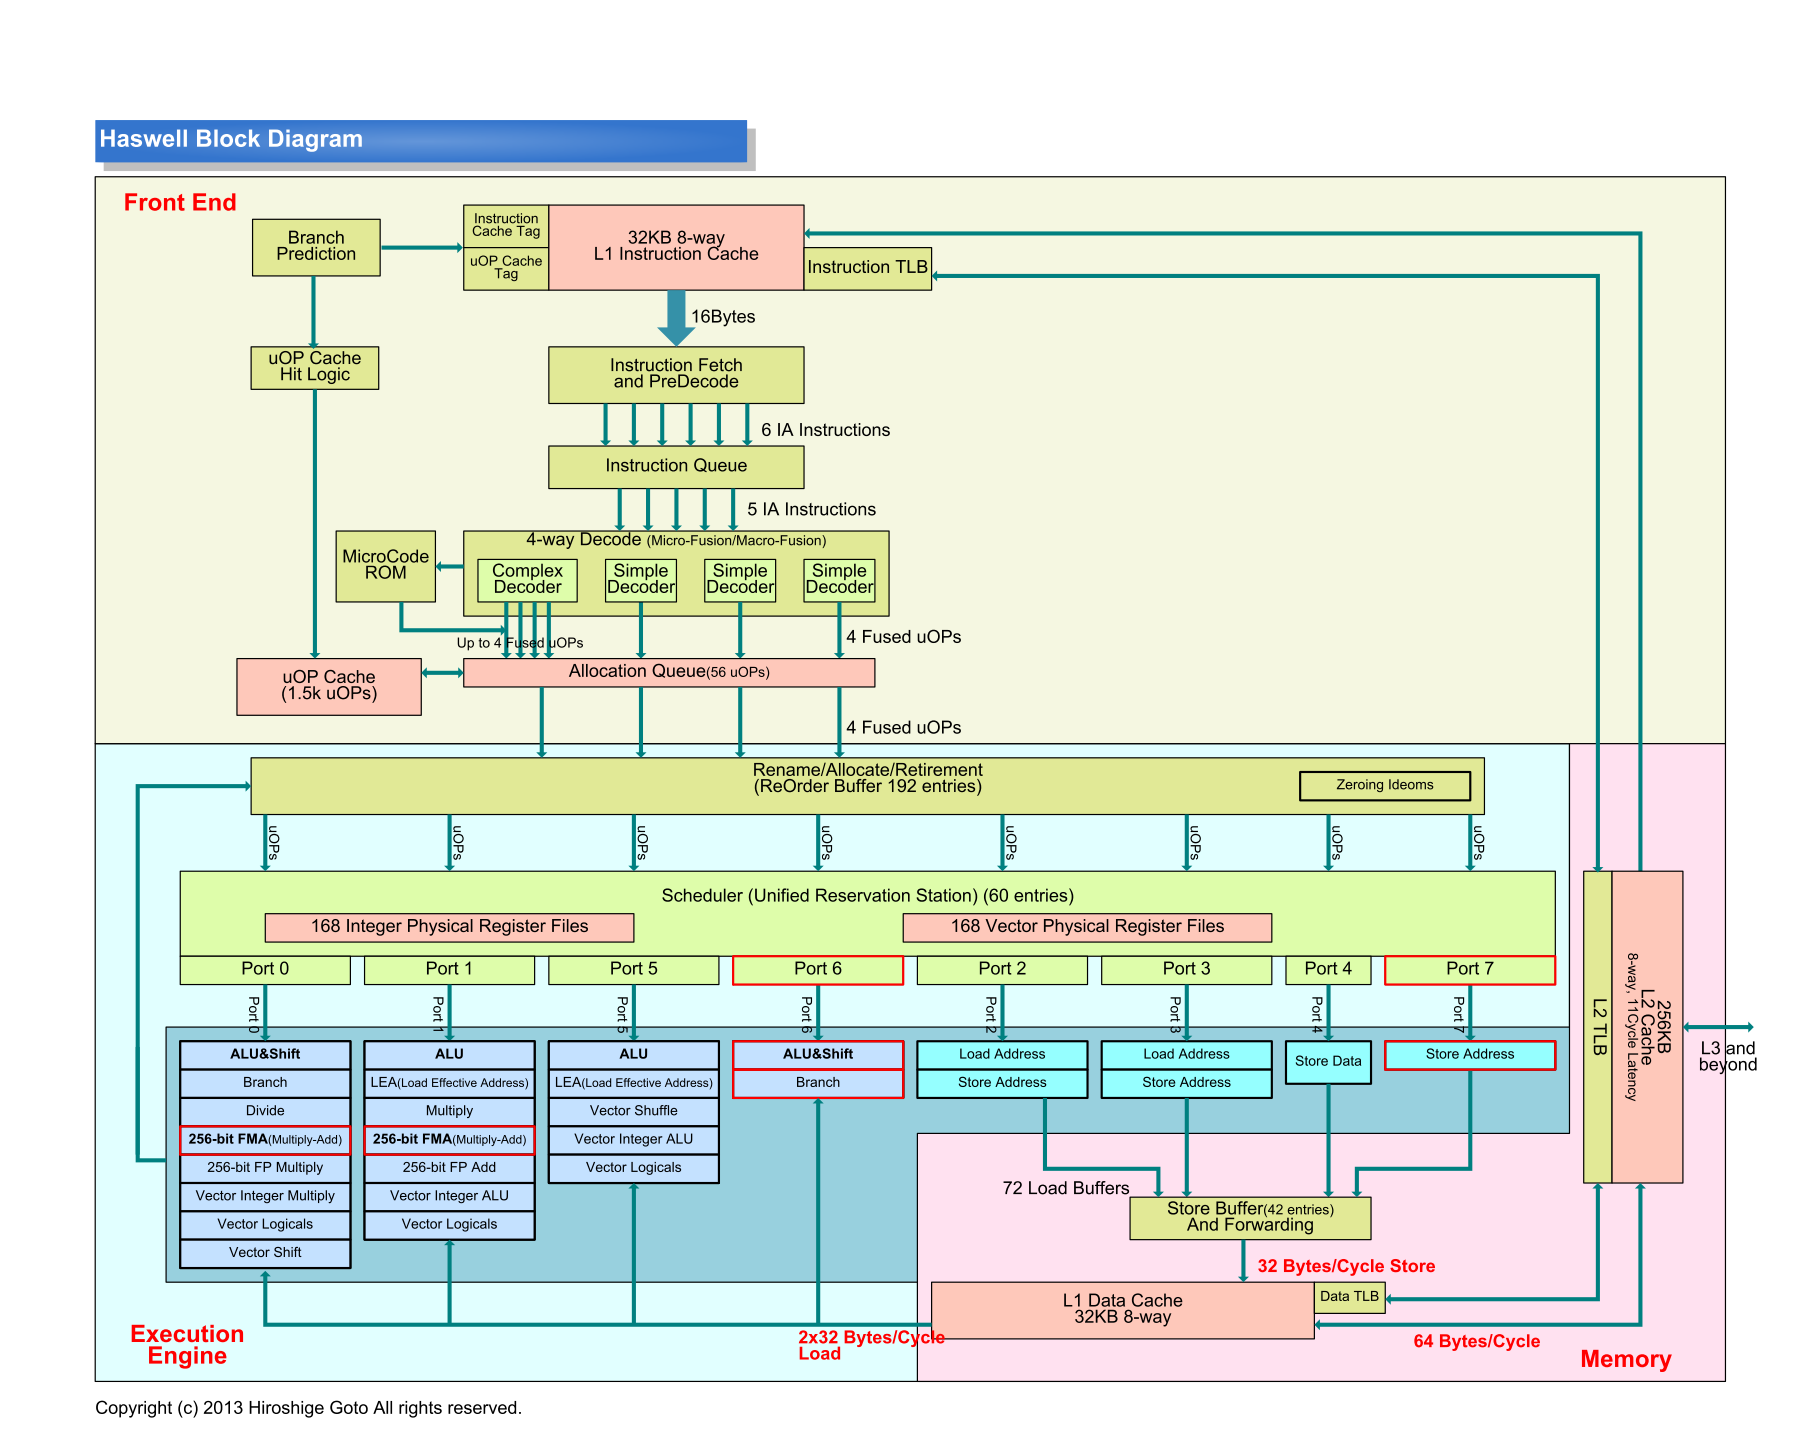 "Haswellマイクロアーキテクチャのブロックダイアグラム図(PDF版は<span class=""img-inline raw""><a href=""/video/pcw/docs/665/735/p10.pdf"" ipw_status=""1"" ipw_linktype=""filelink_raw"" class=""resource"">こちら</a></span>)"